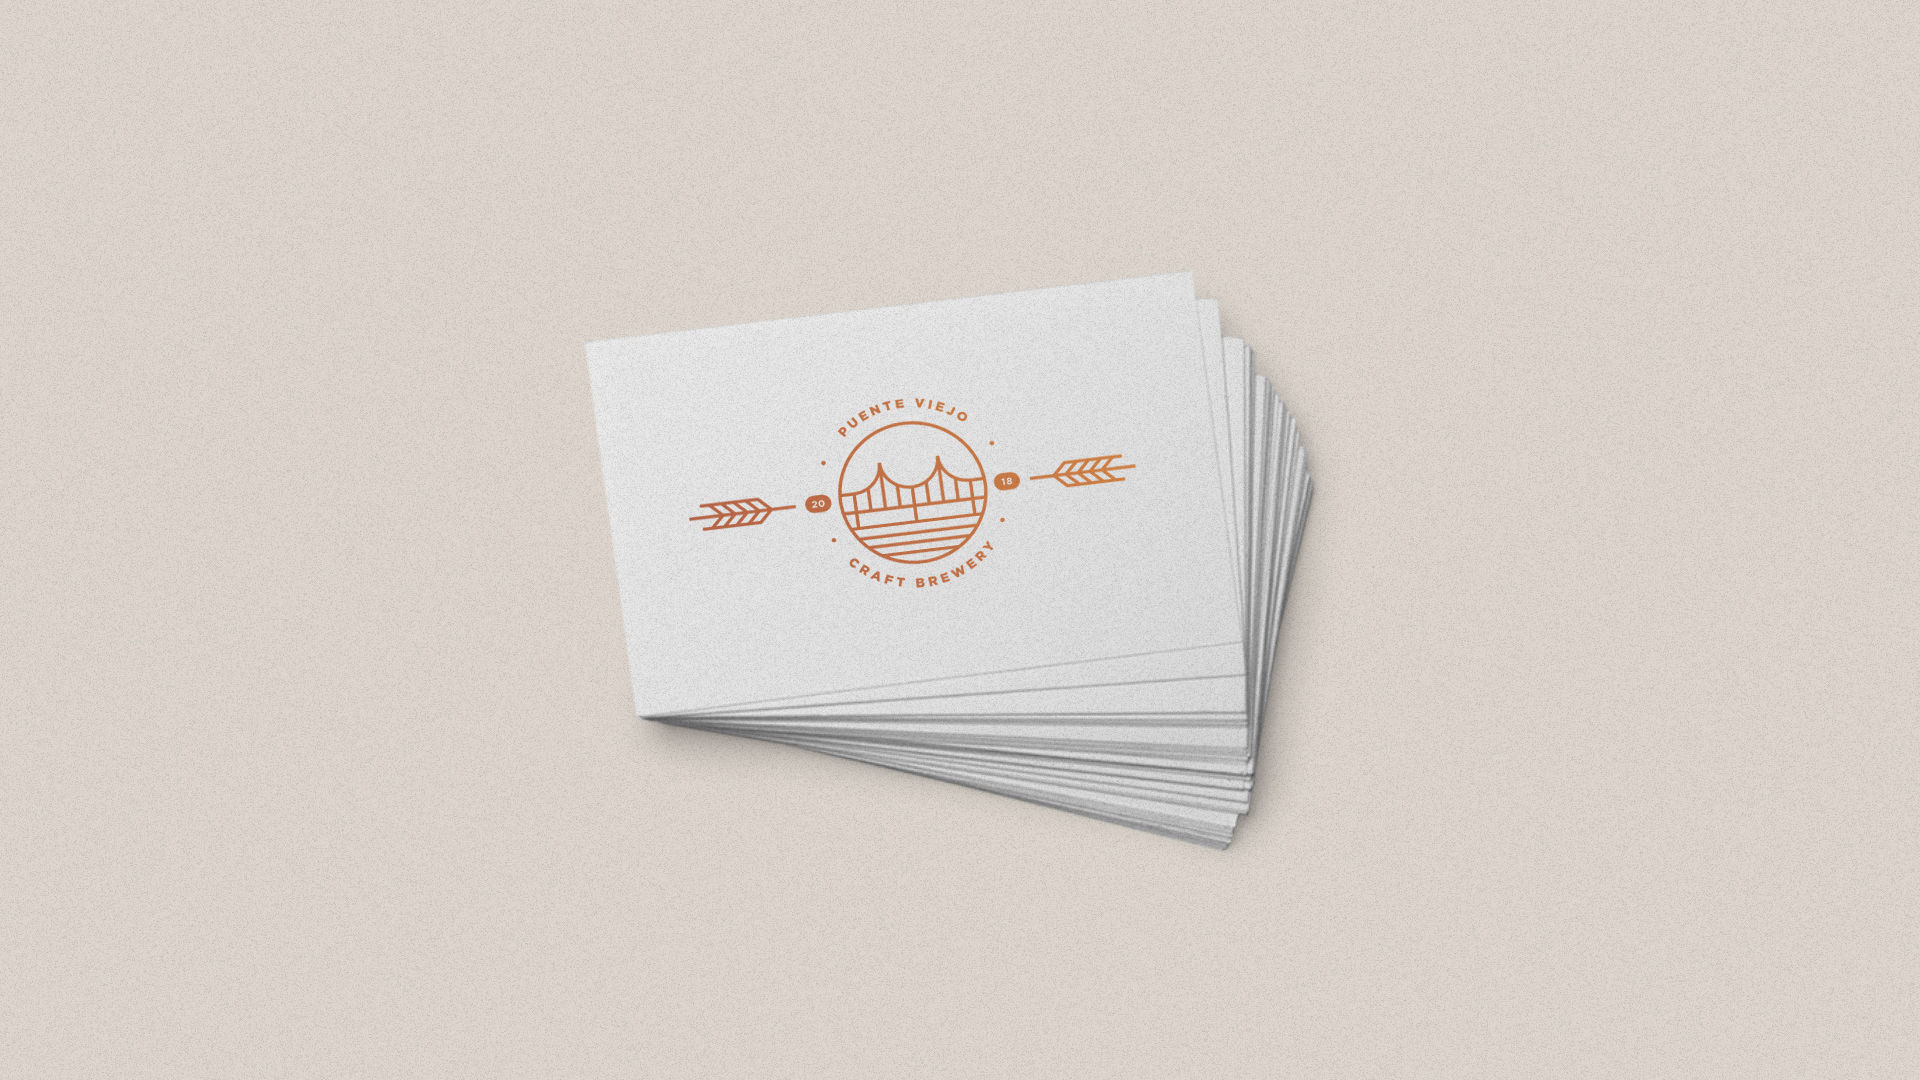 fmx_puenteviejo_tarjetas